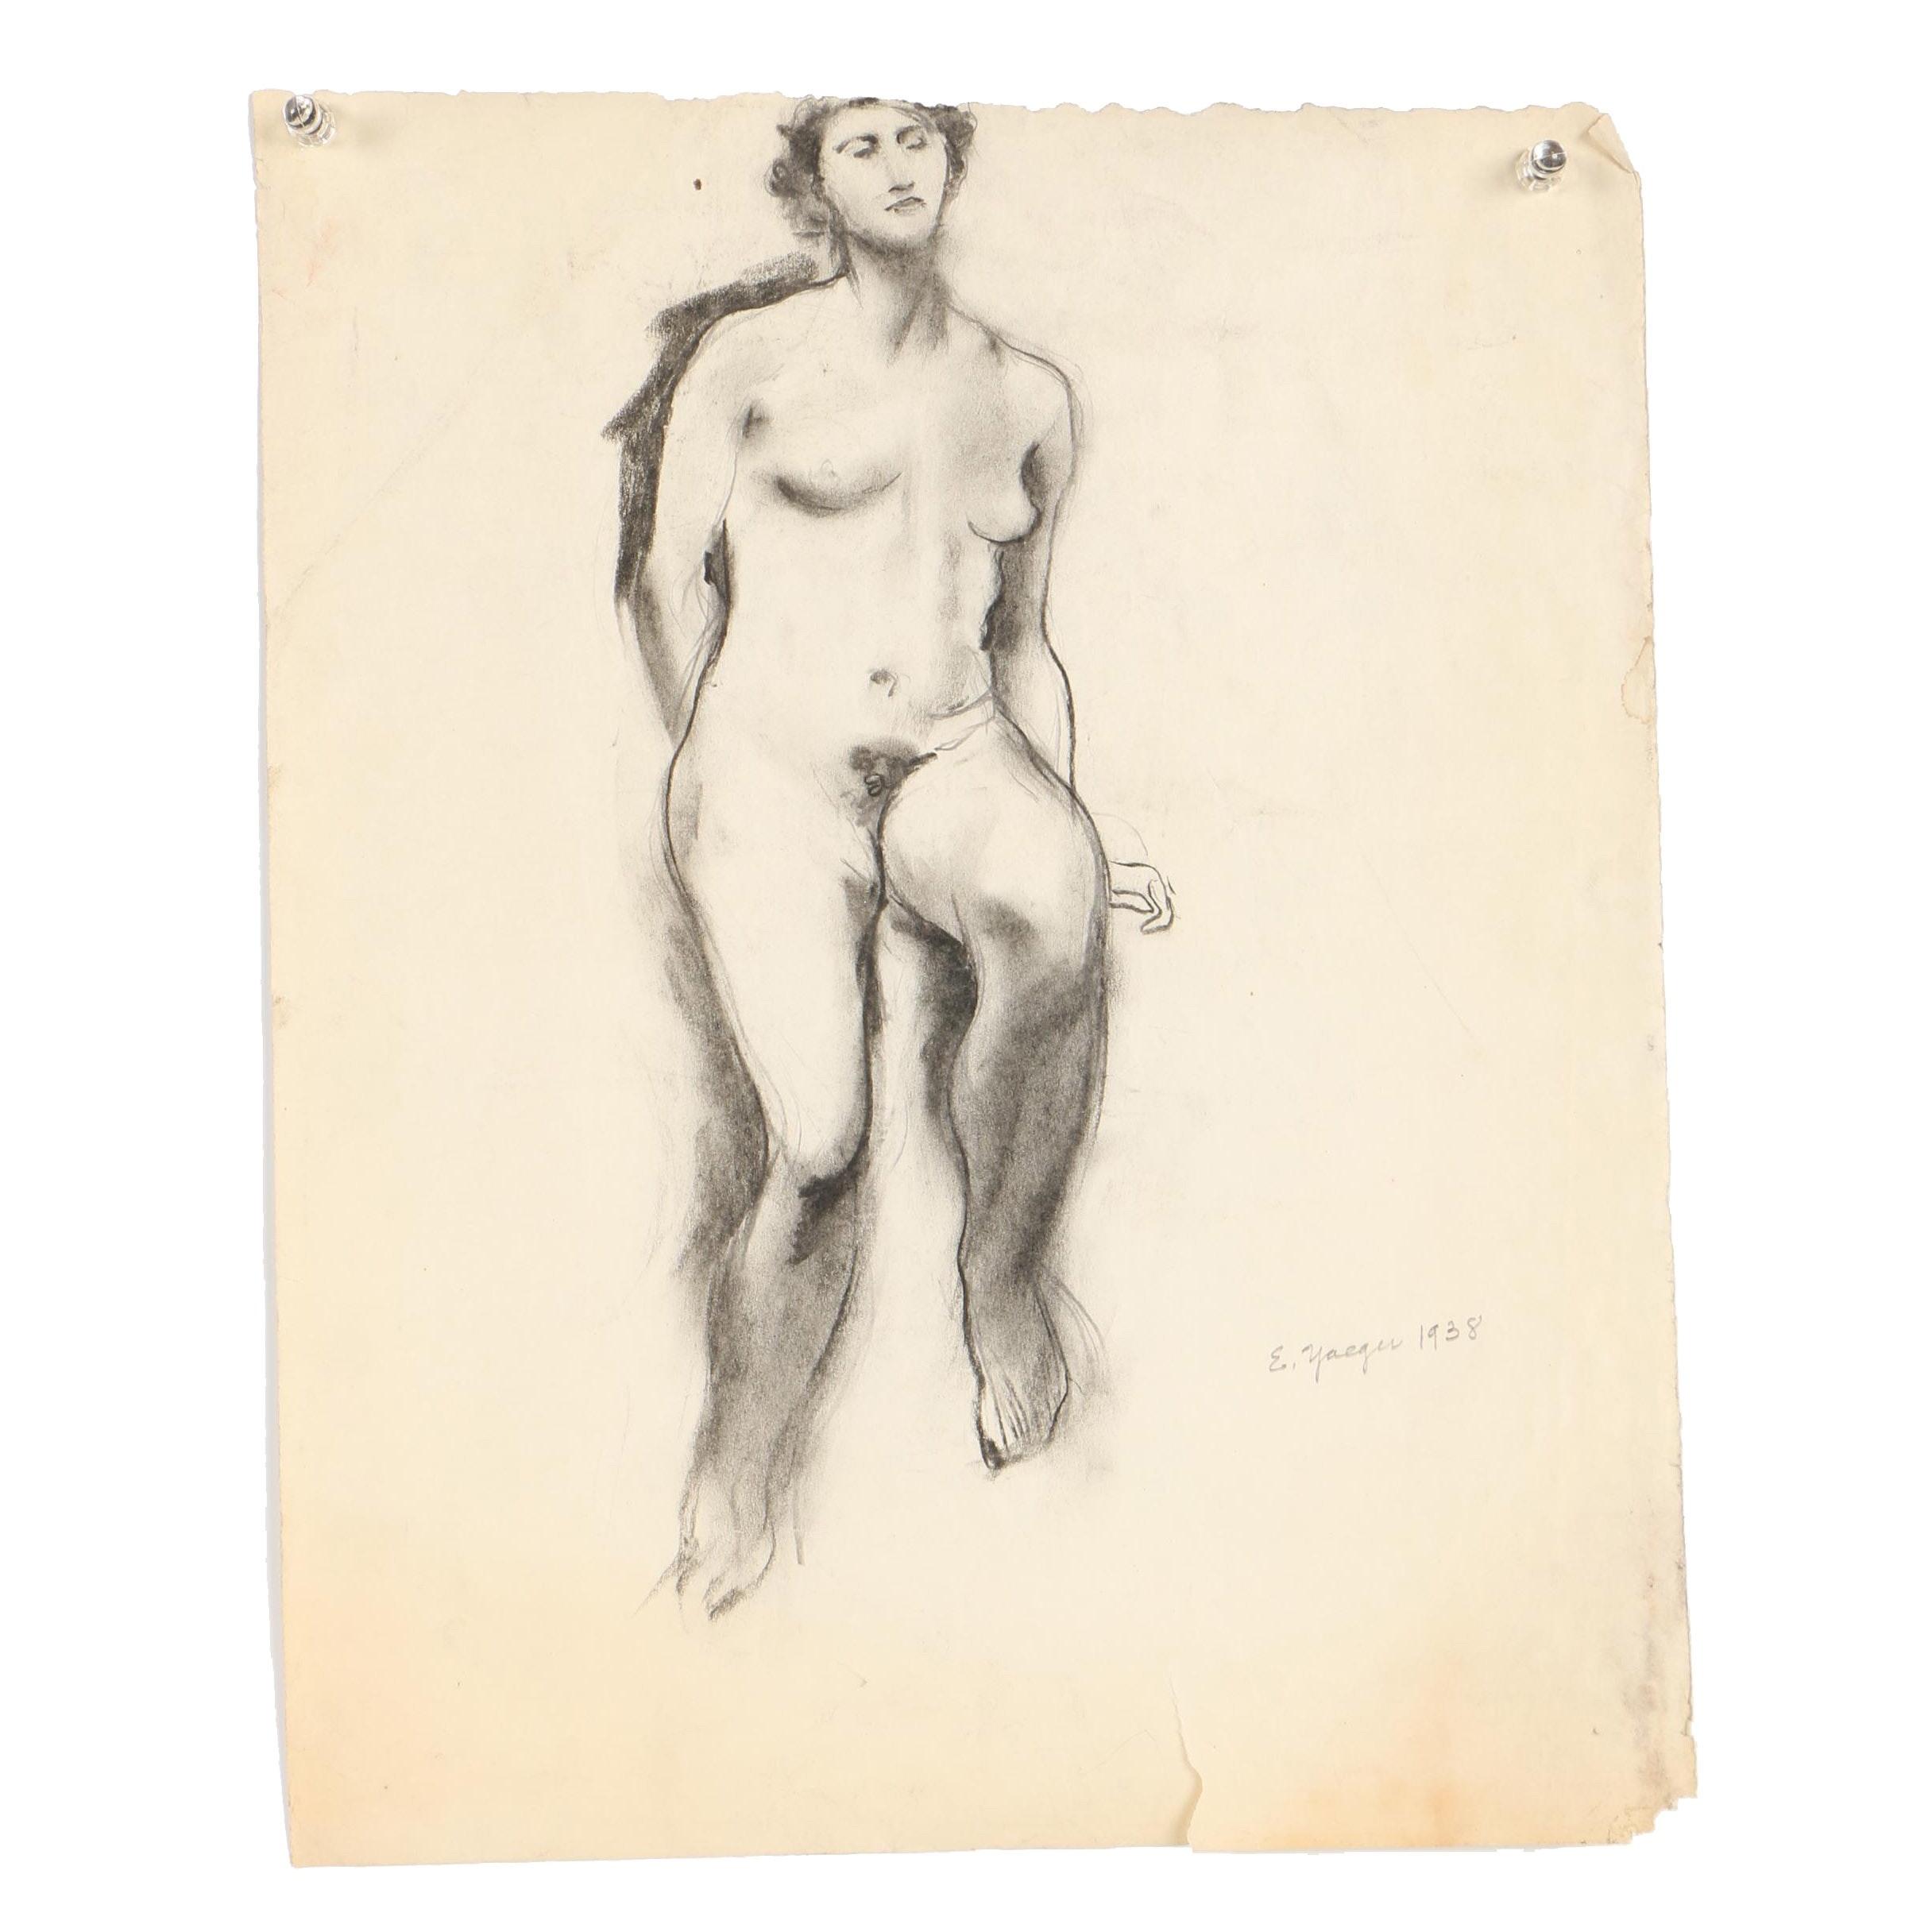 Edgar Yaeger Charcoal Drawing